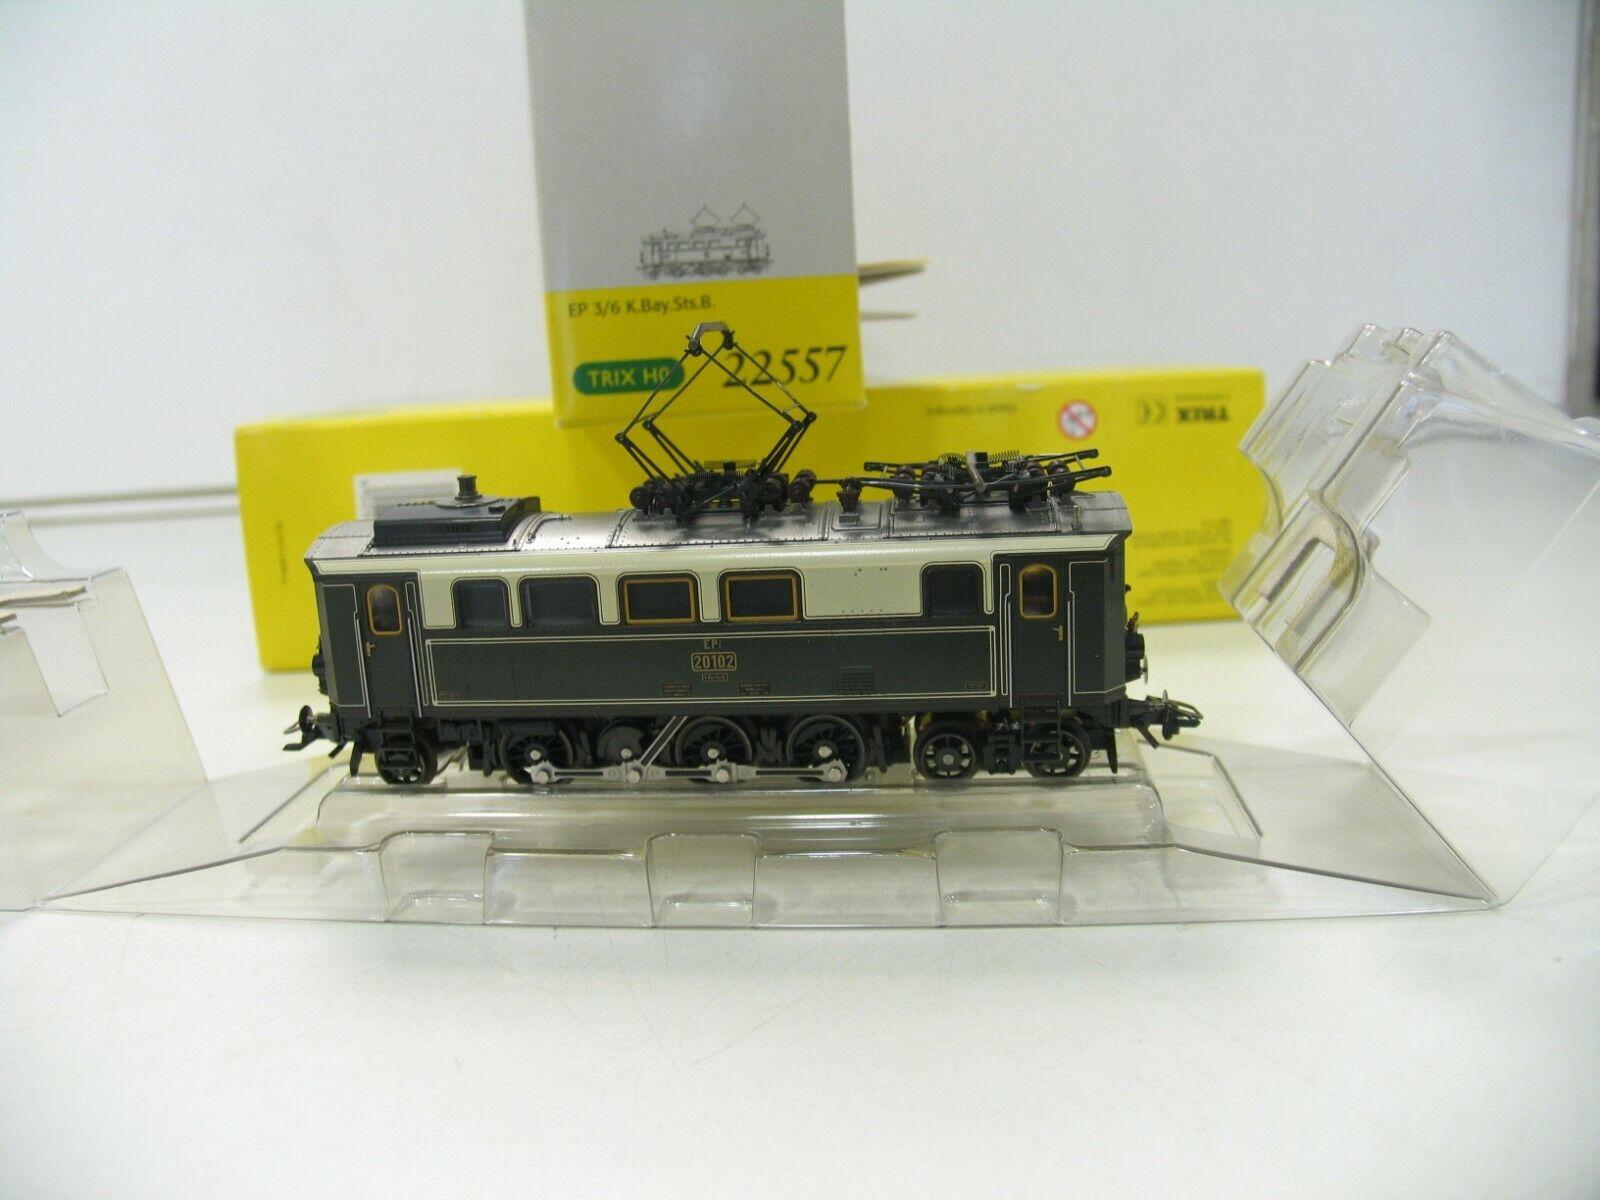 Trix 22557 E-Lok Ep 3 6 Cream verde della baia di K.STS.B. Khn Decoder NH2177